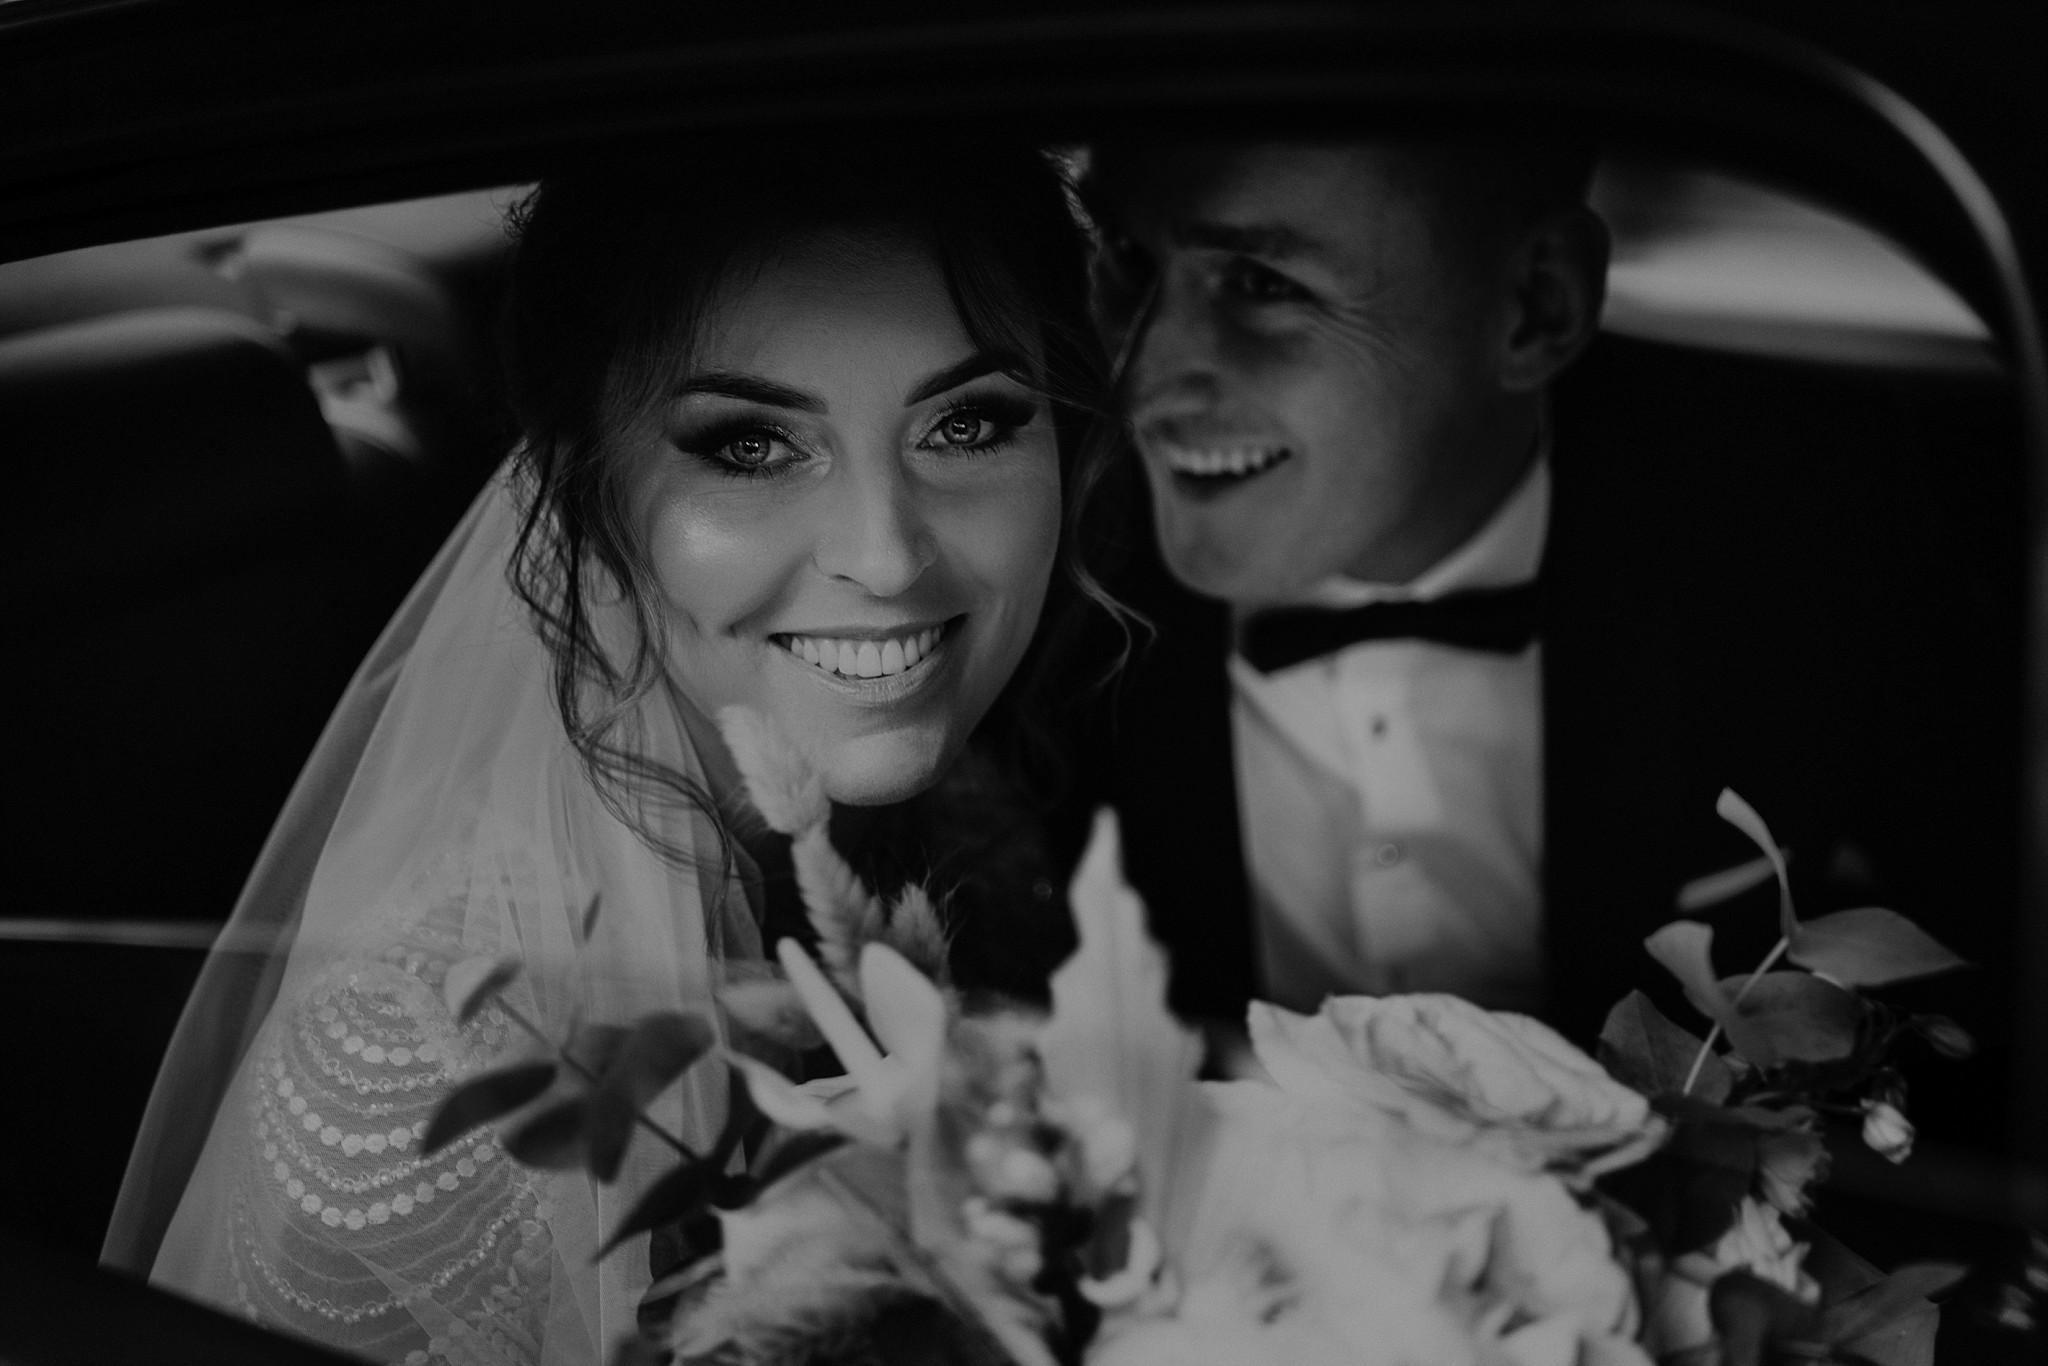 fotograf poznan wesele dobra truskawka piekne wesele pod poznaniem wesele w dobrej truskawce piekna para mloda slub marzen slub koronawirus slub listopad wesele koronawirus 122